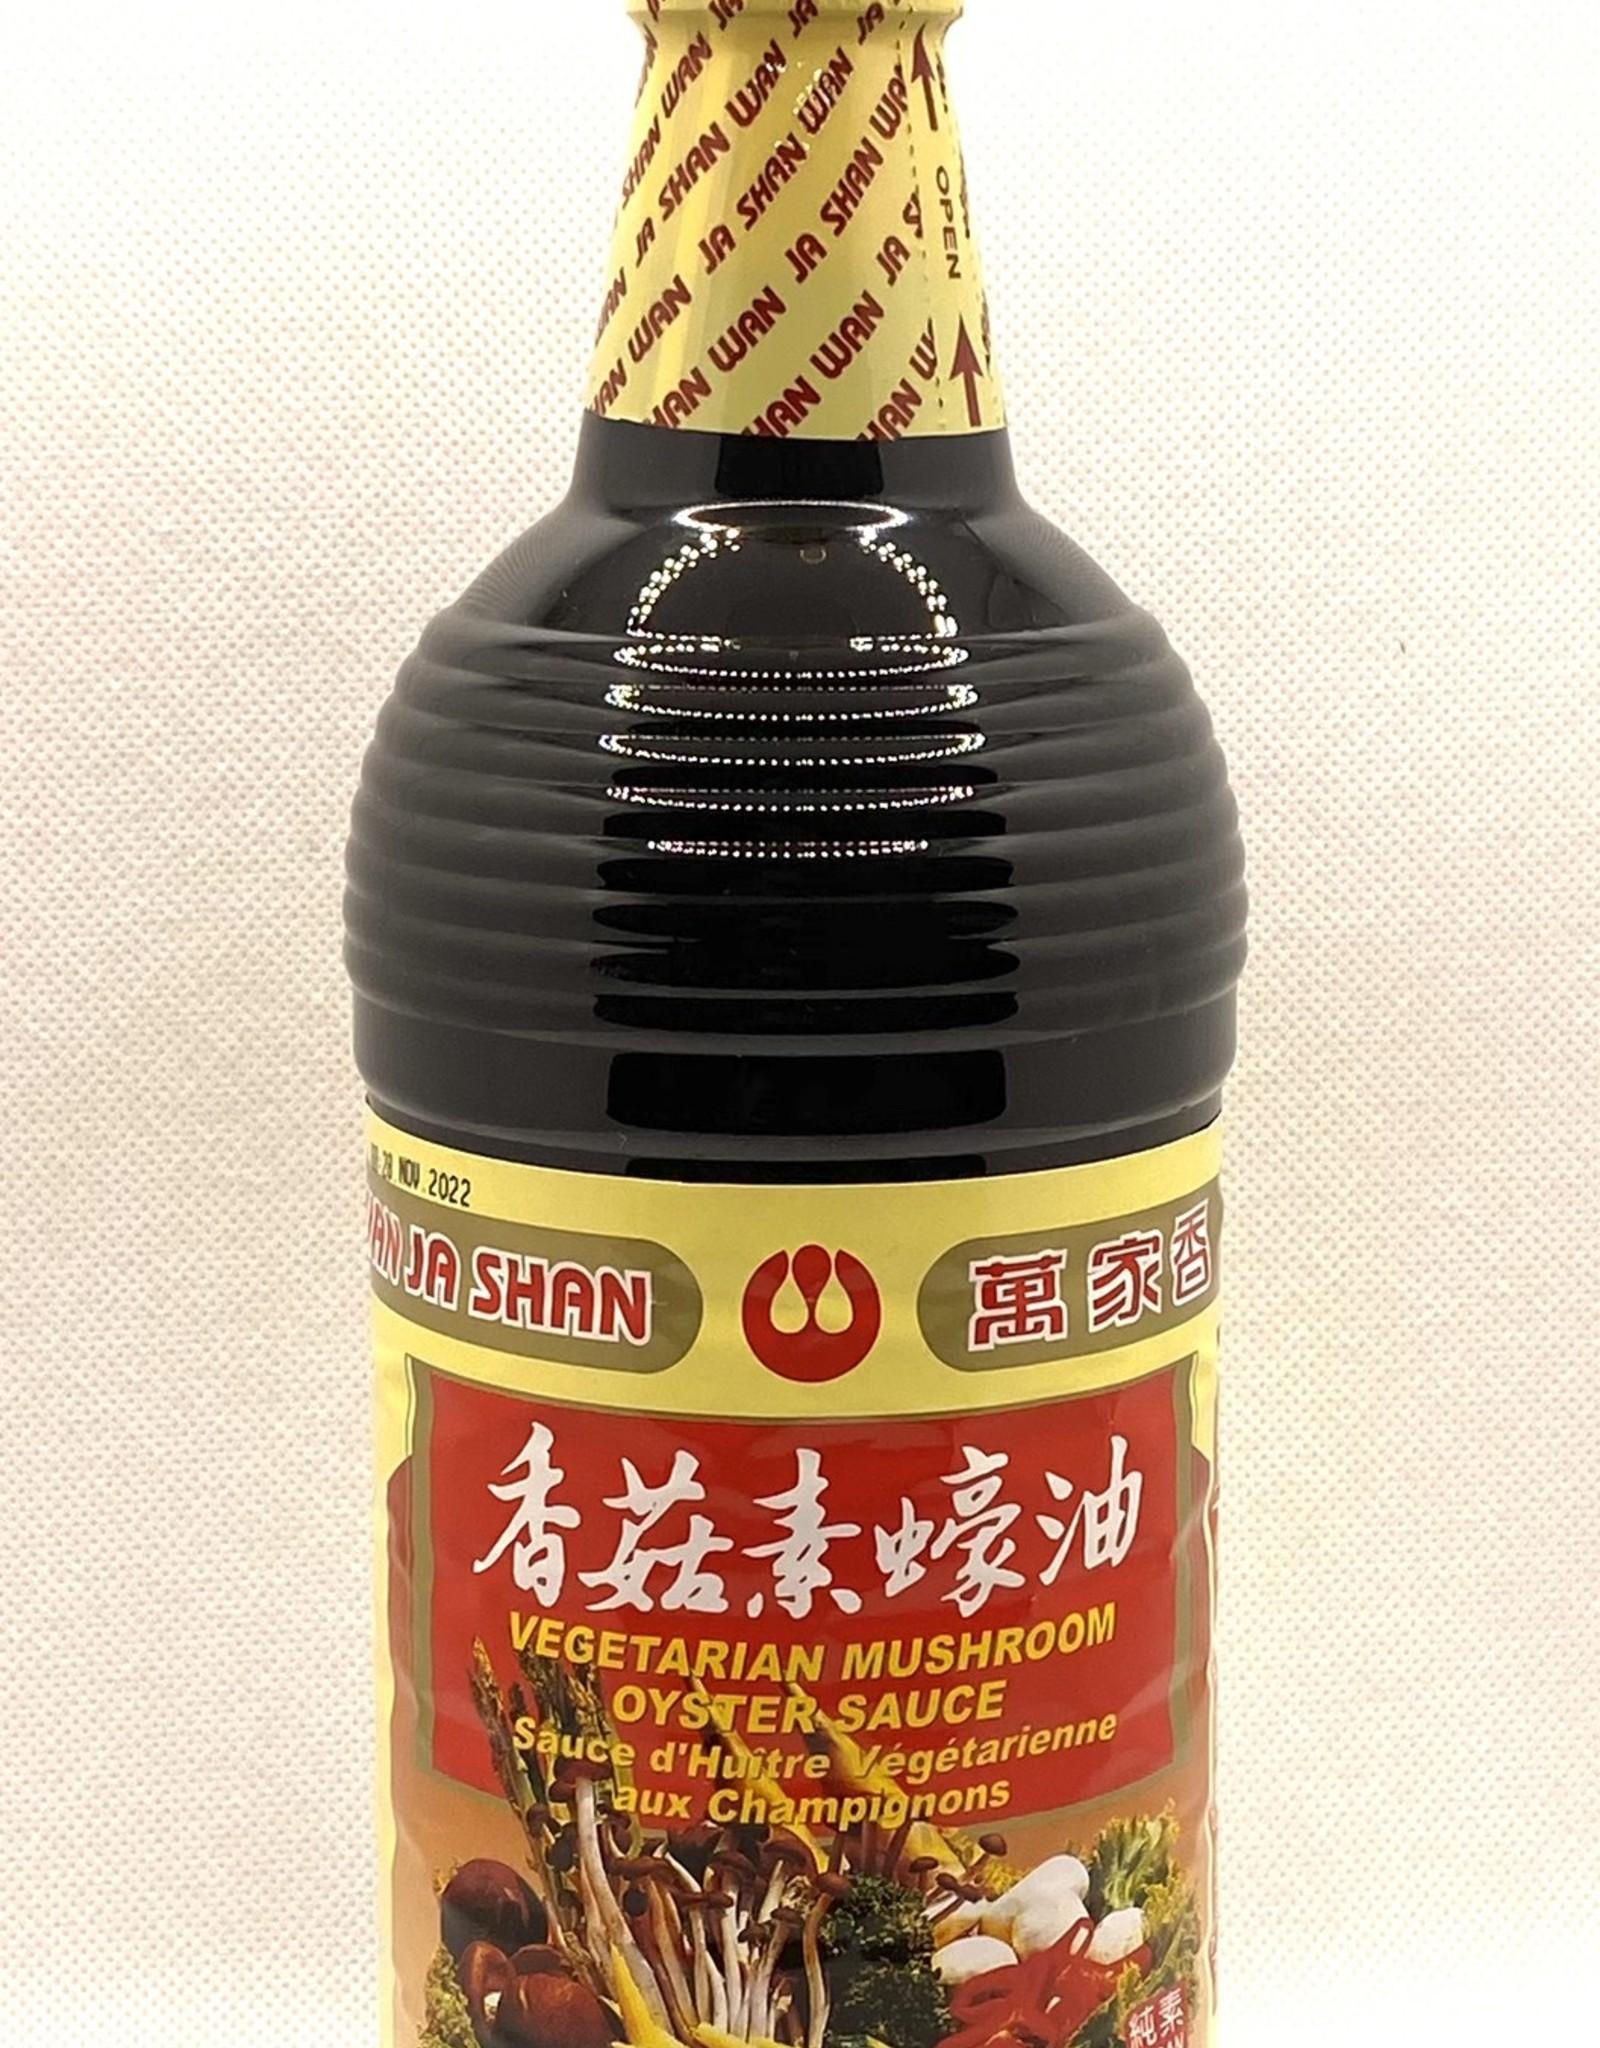 (LW) Vegan Oyester Sauce*(鴻運) 香菇素蠔油